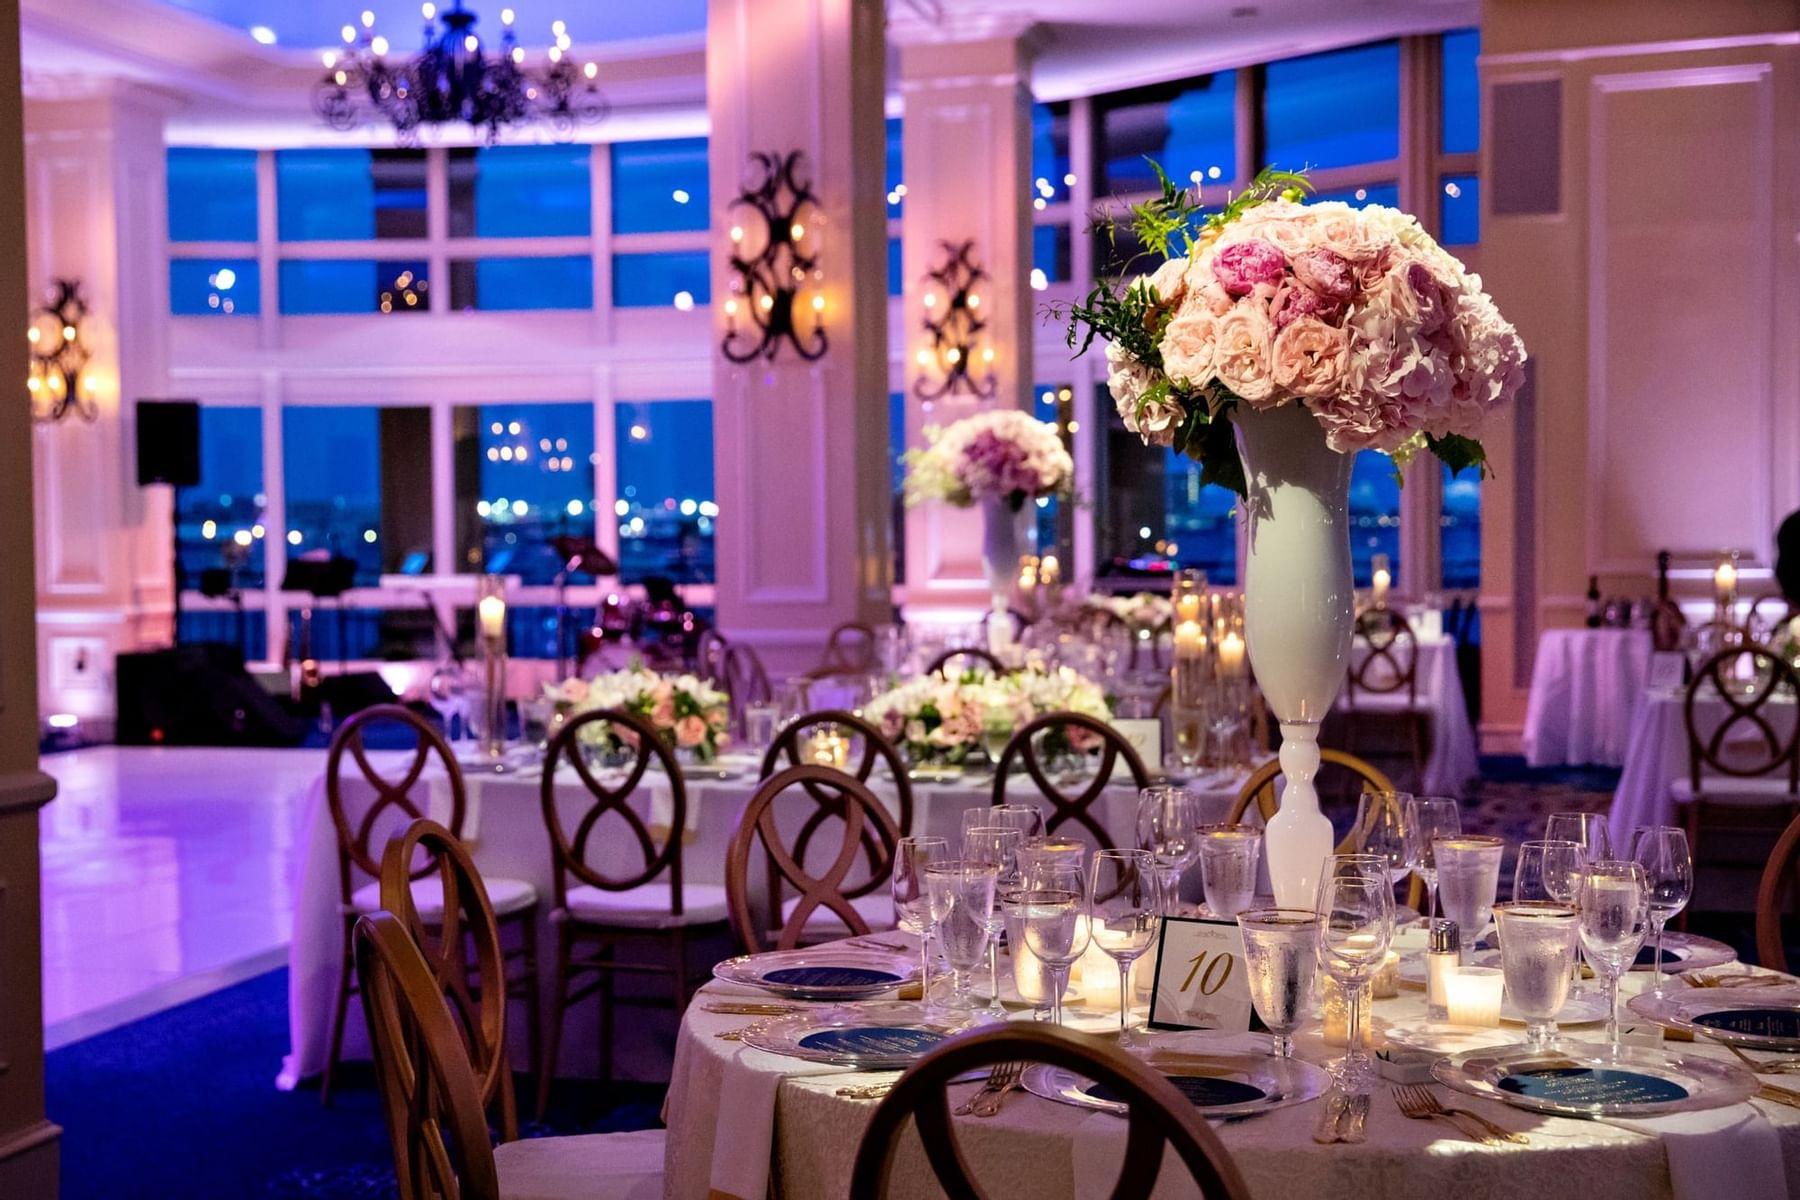 Conference room set up for wedding reception